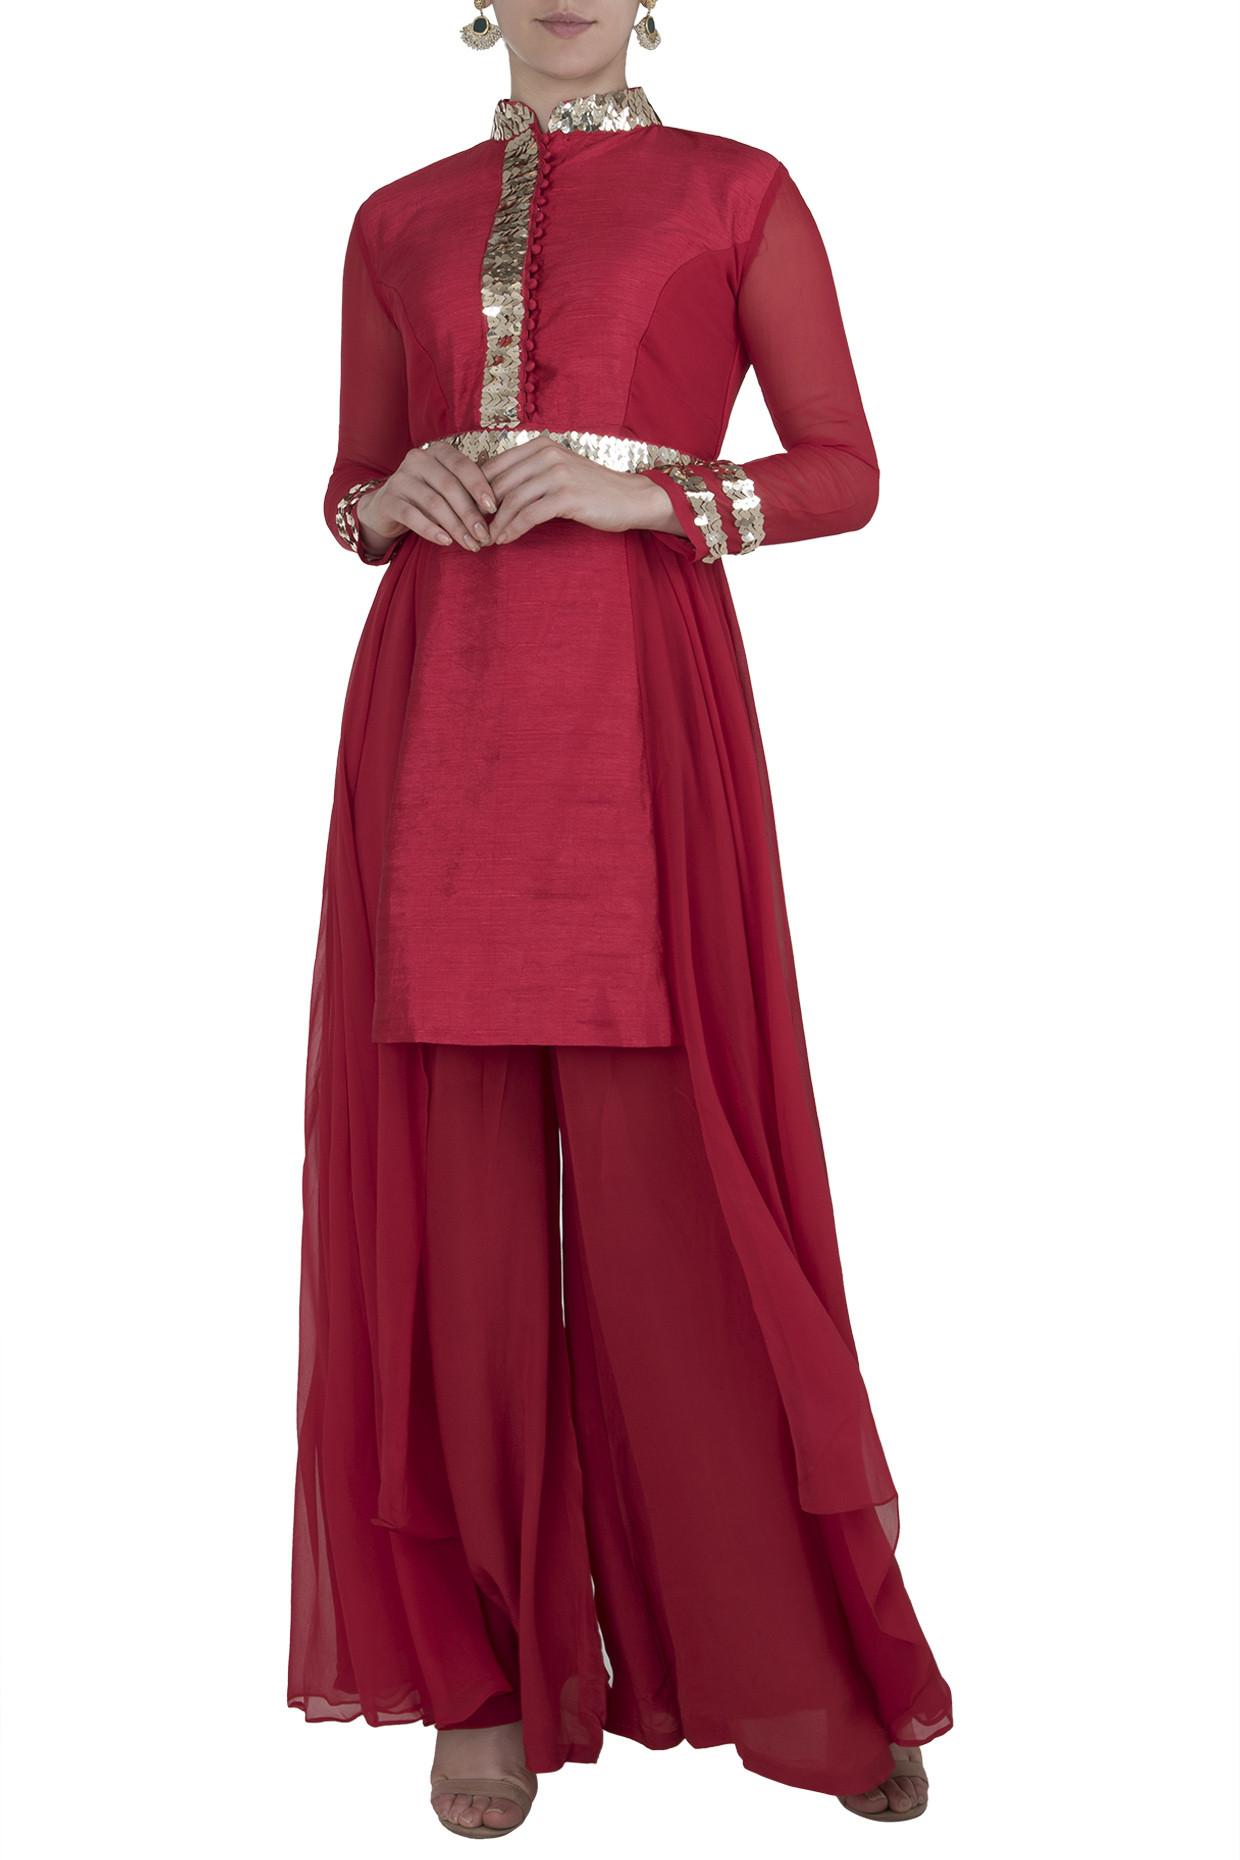 Red Boho Kurta with Flared Pants by Rishi & Vibhuti